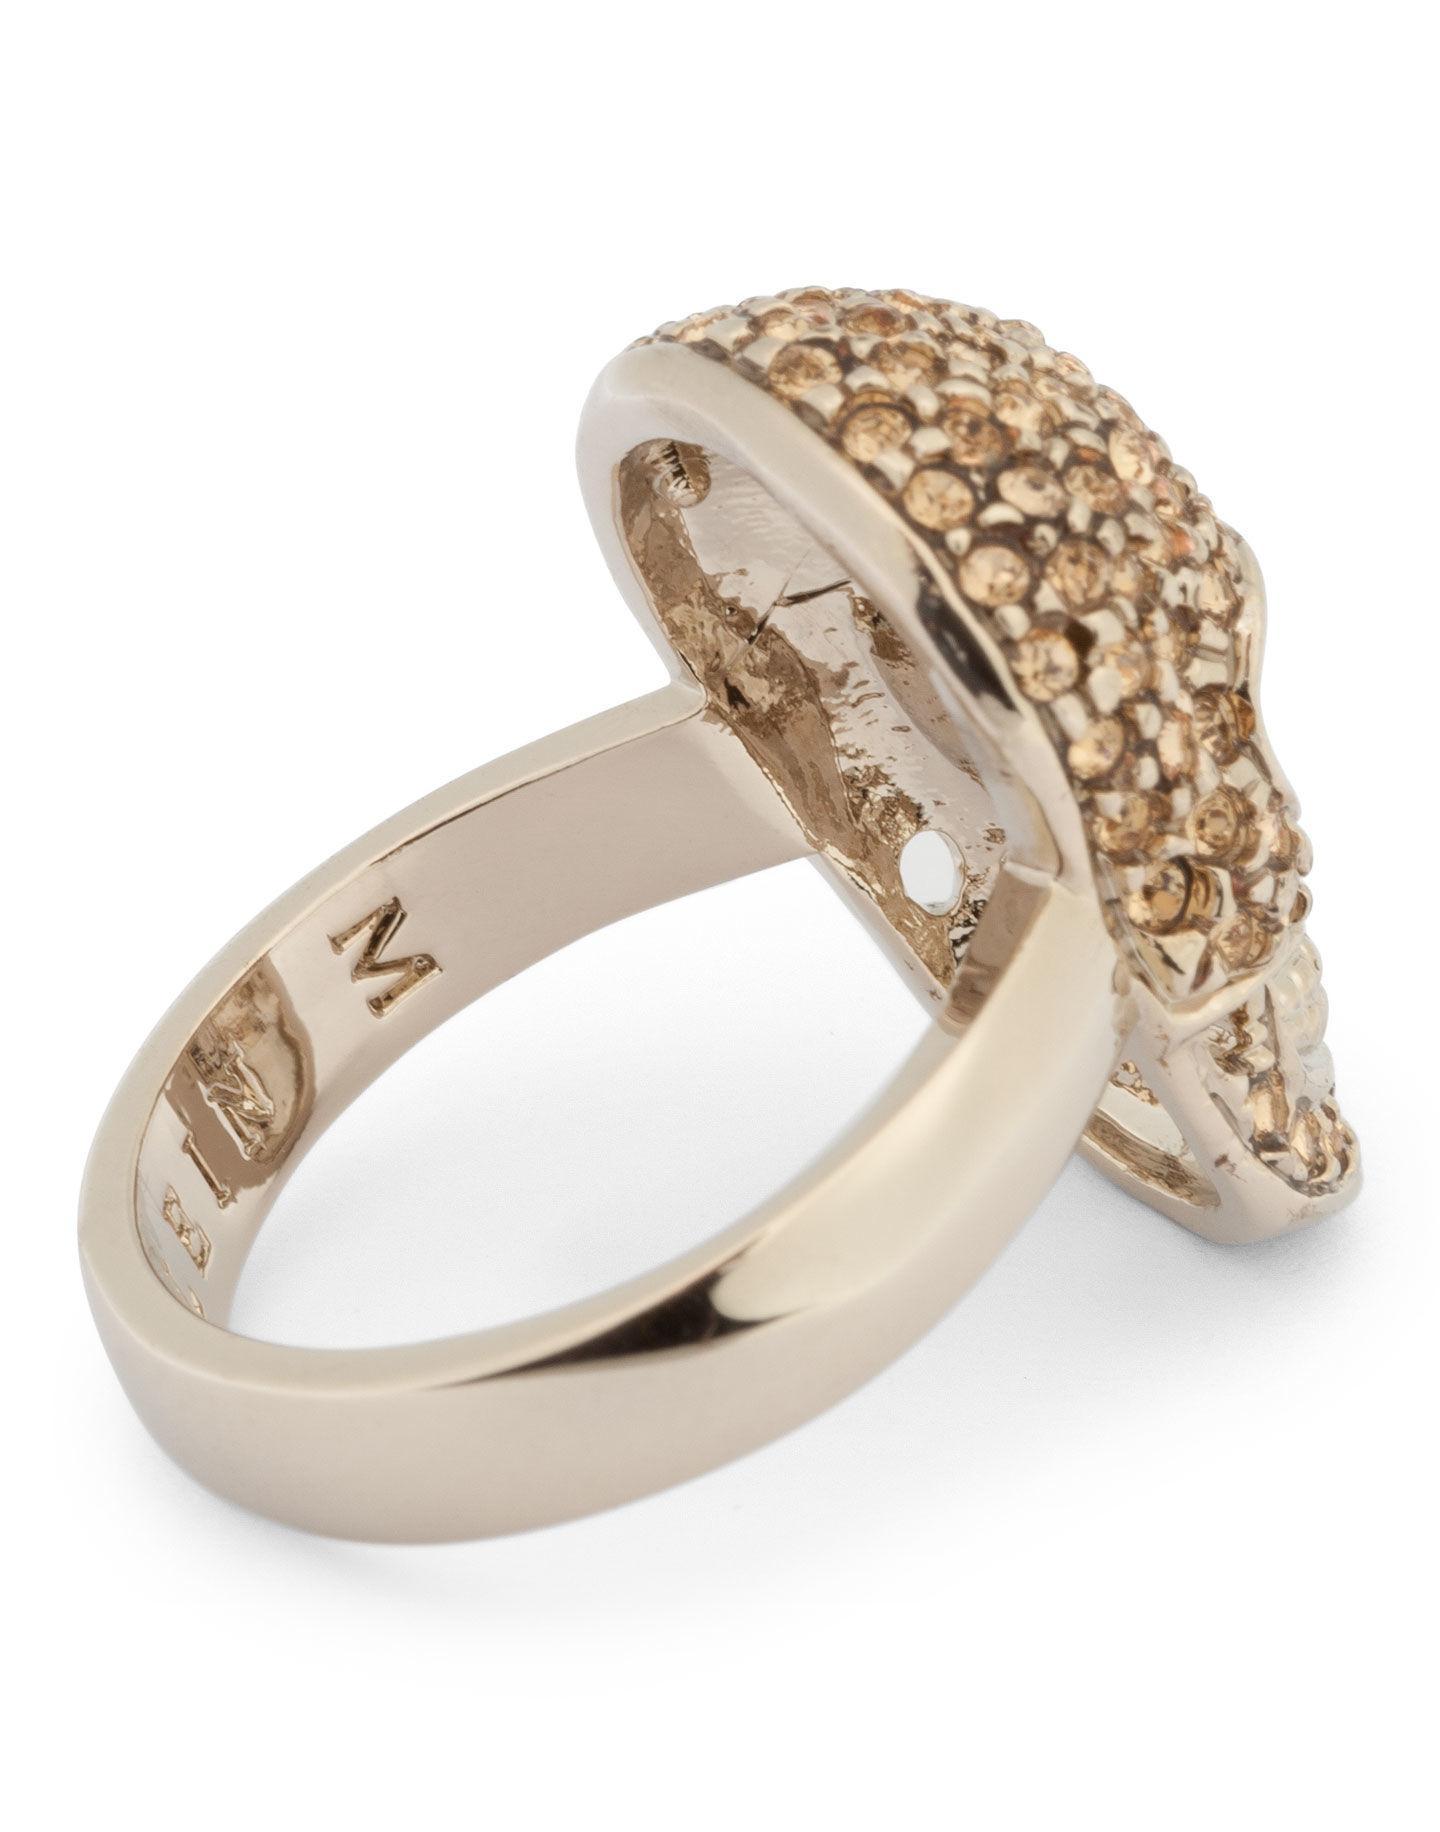 Philipp Plein Embellished Skull Ring in Gold (Metallic)